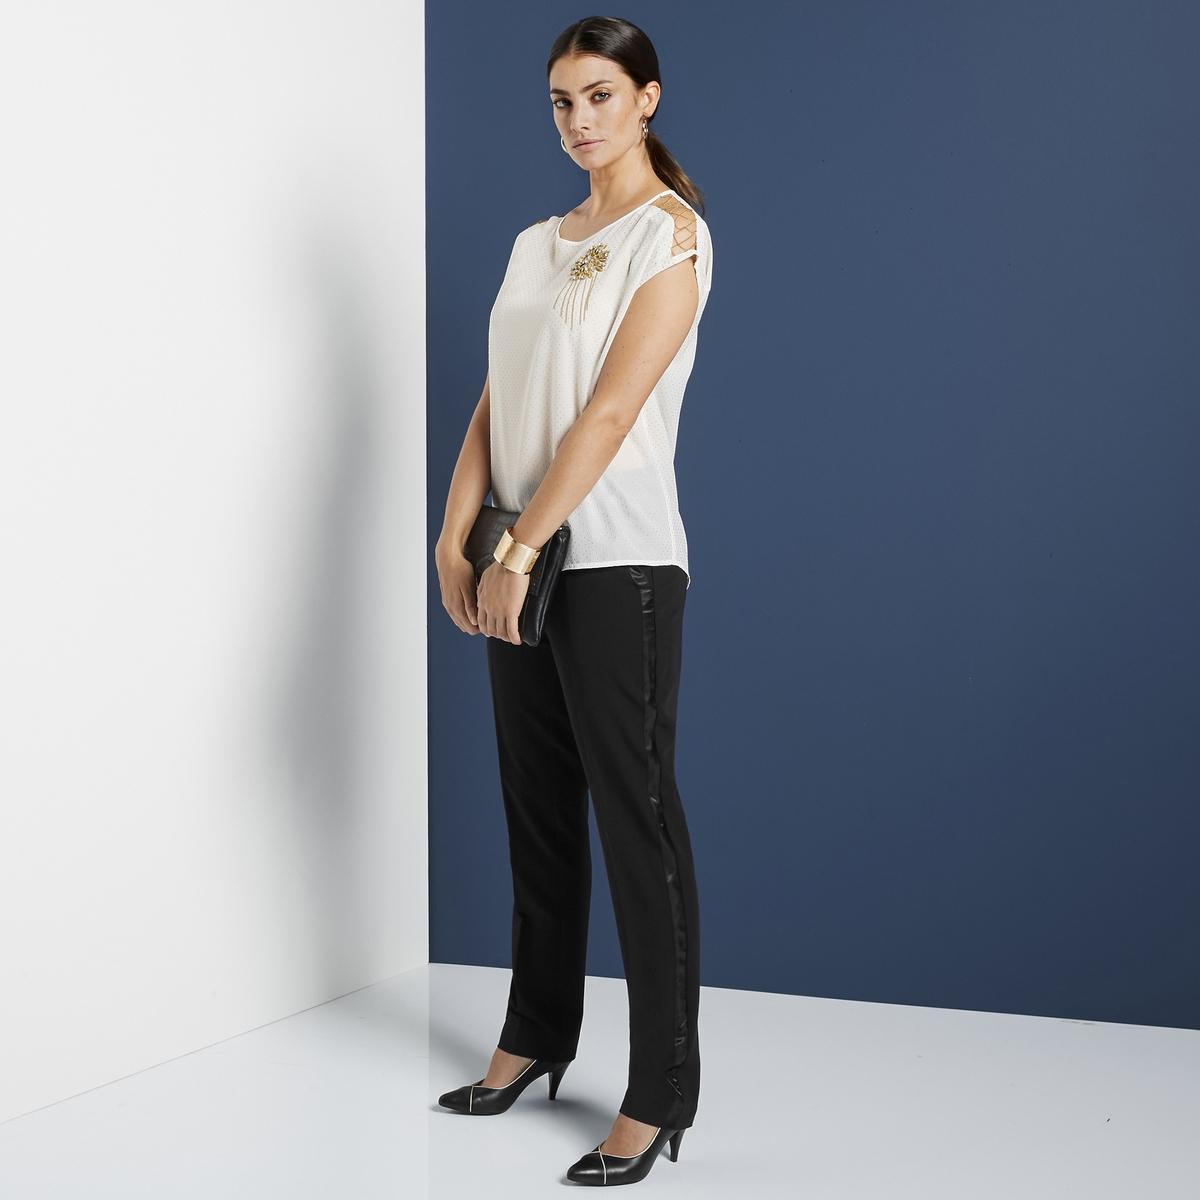 Imagen secundaria de producto de Zapatos de tacón gris, cortes dorados - Anne weyburn